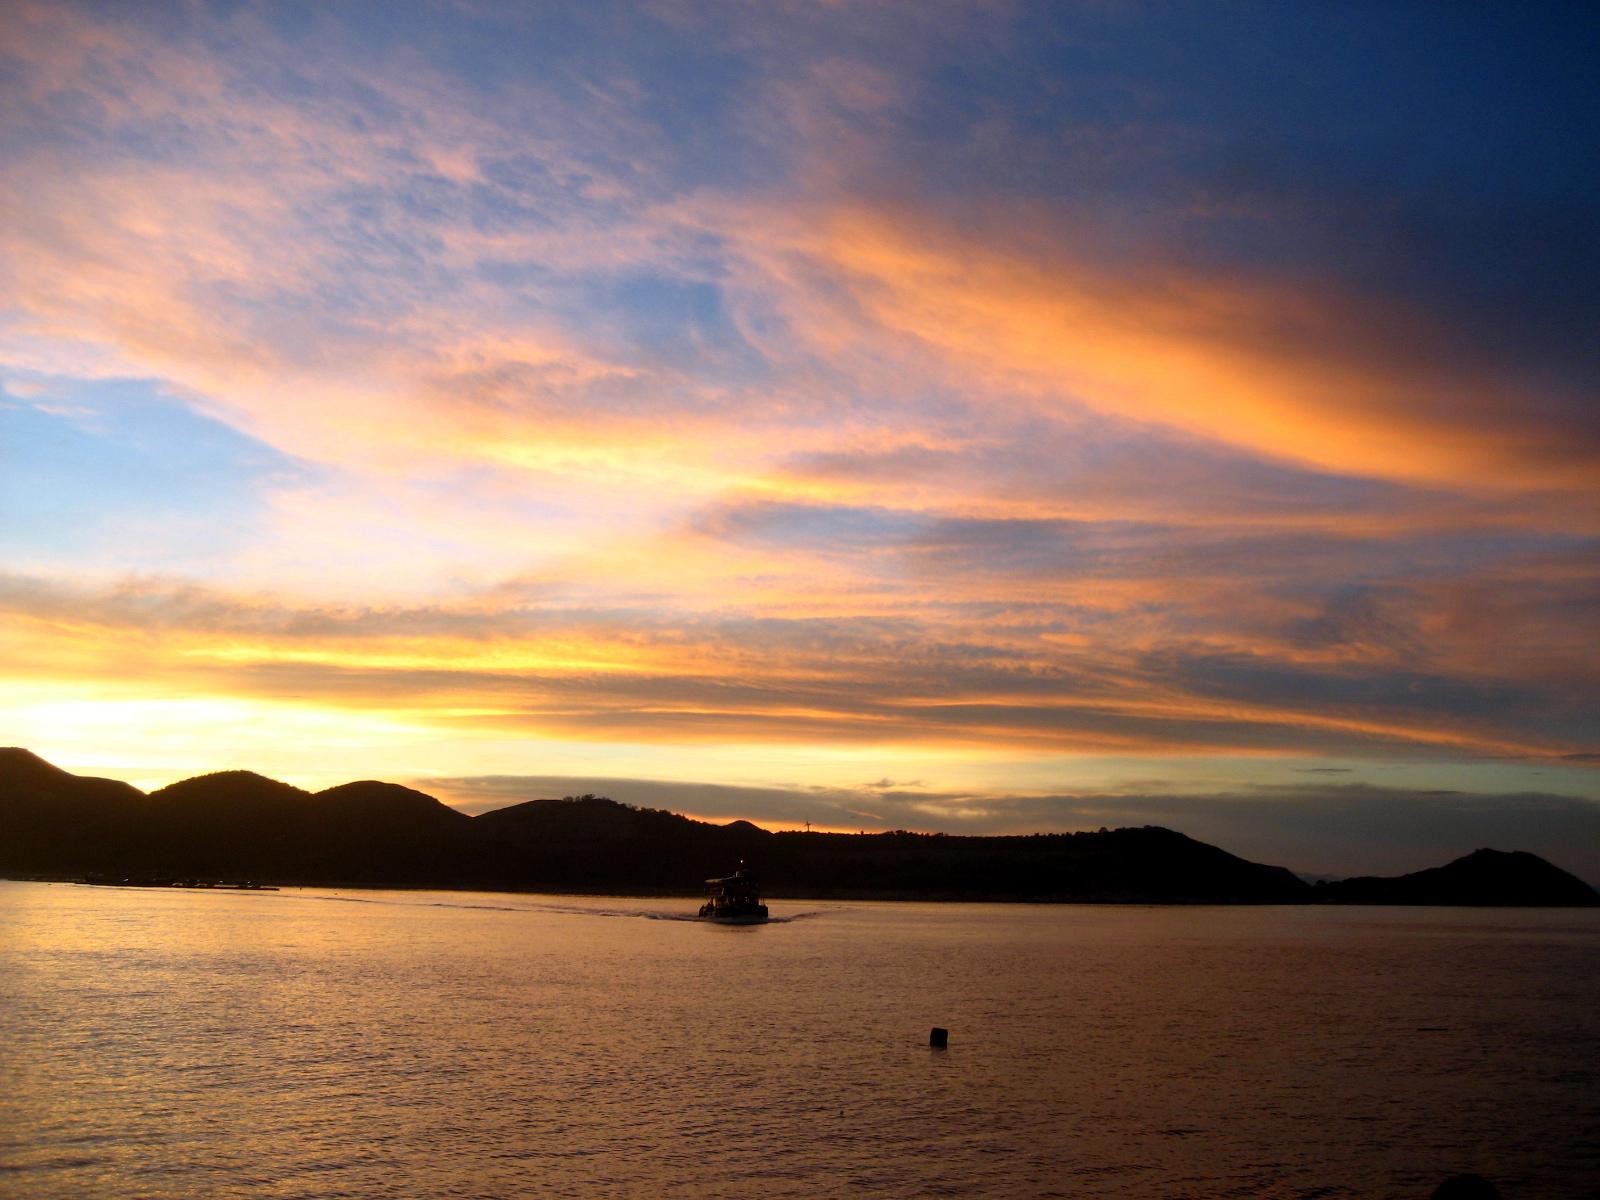 0909 sunset